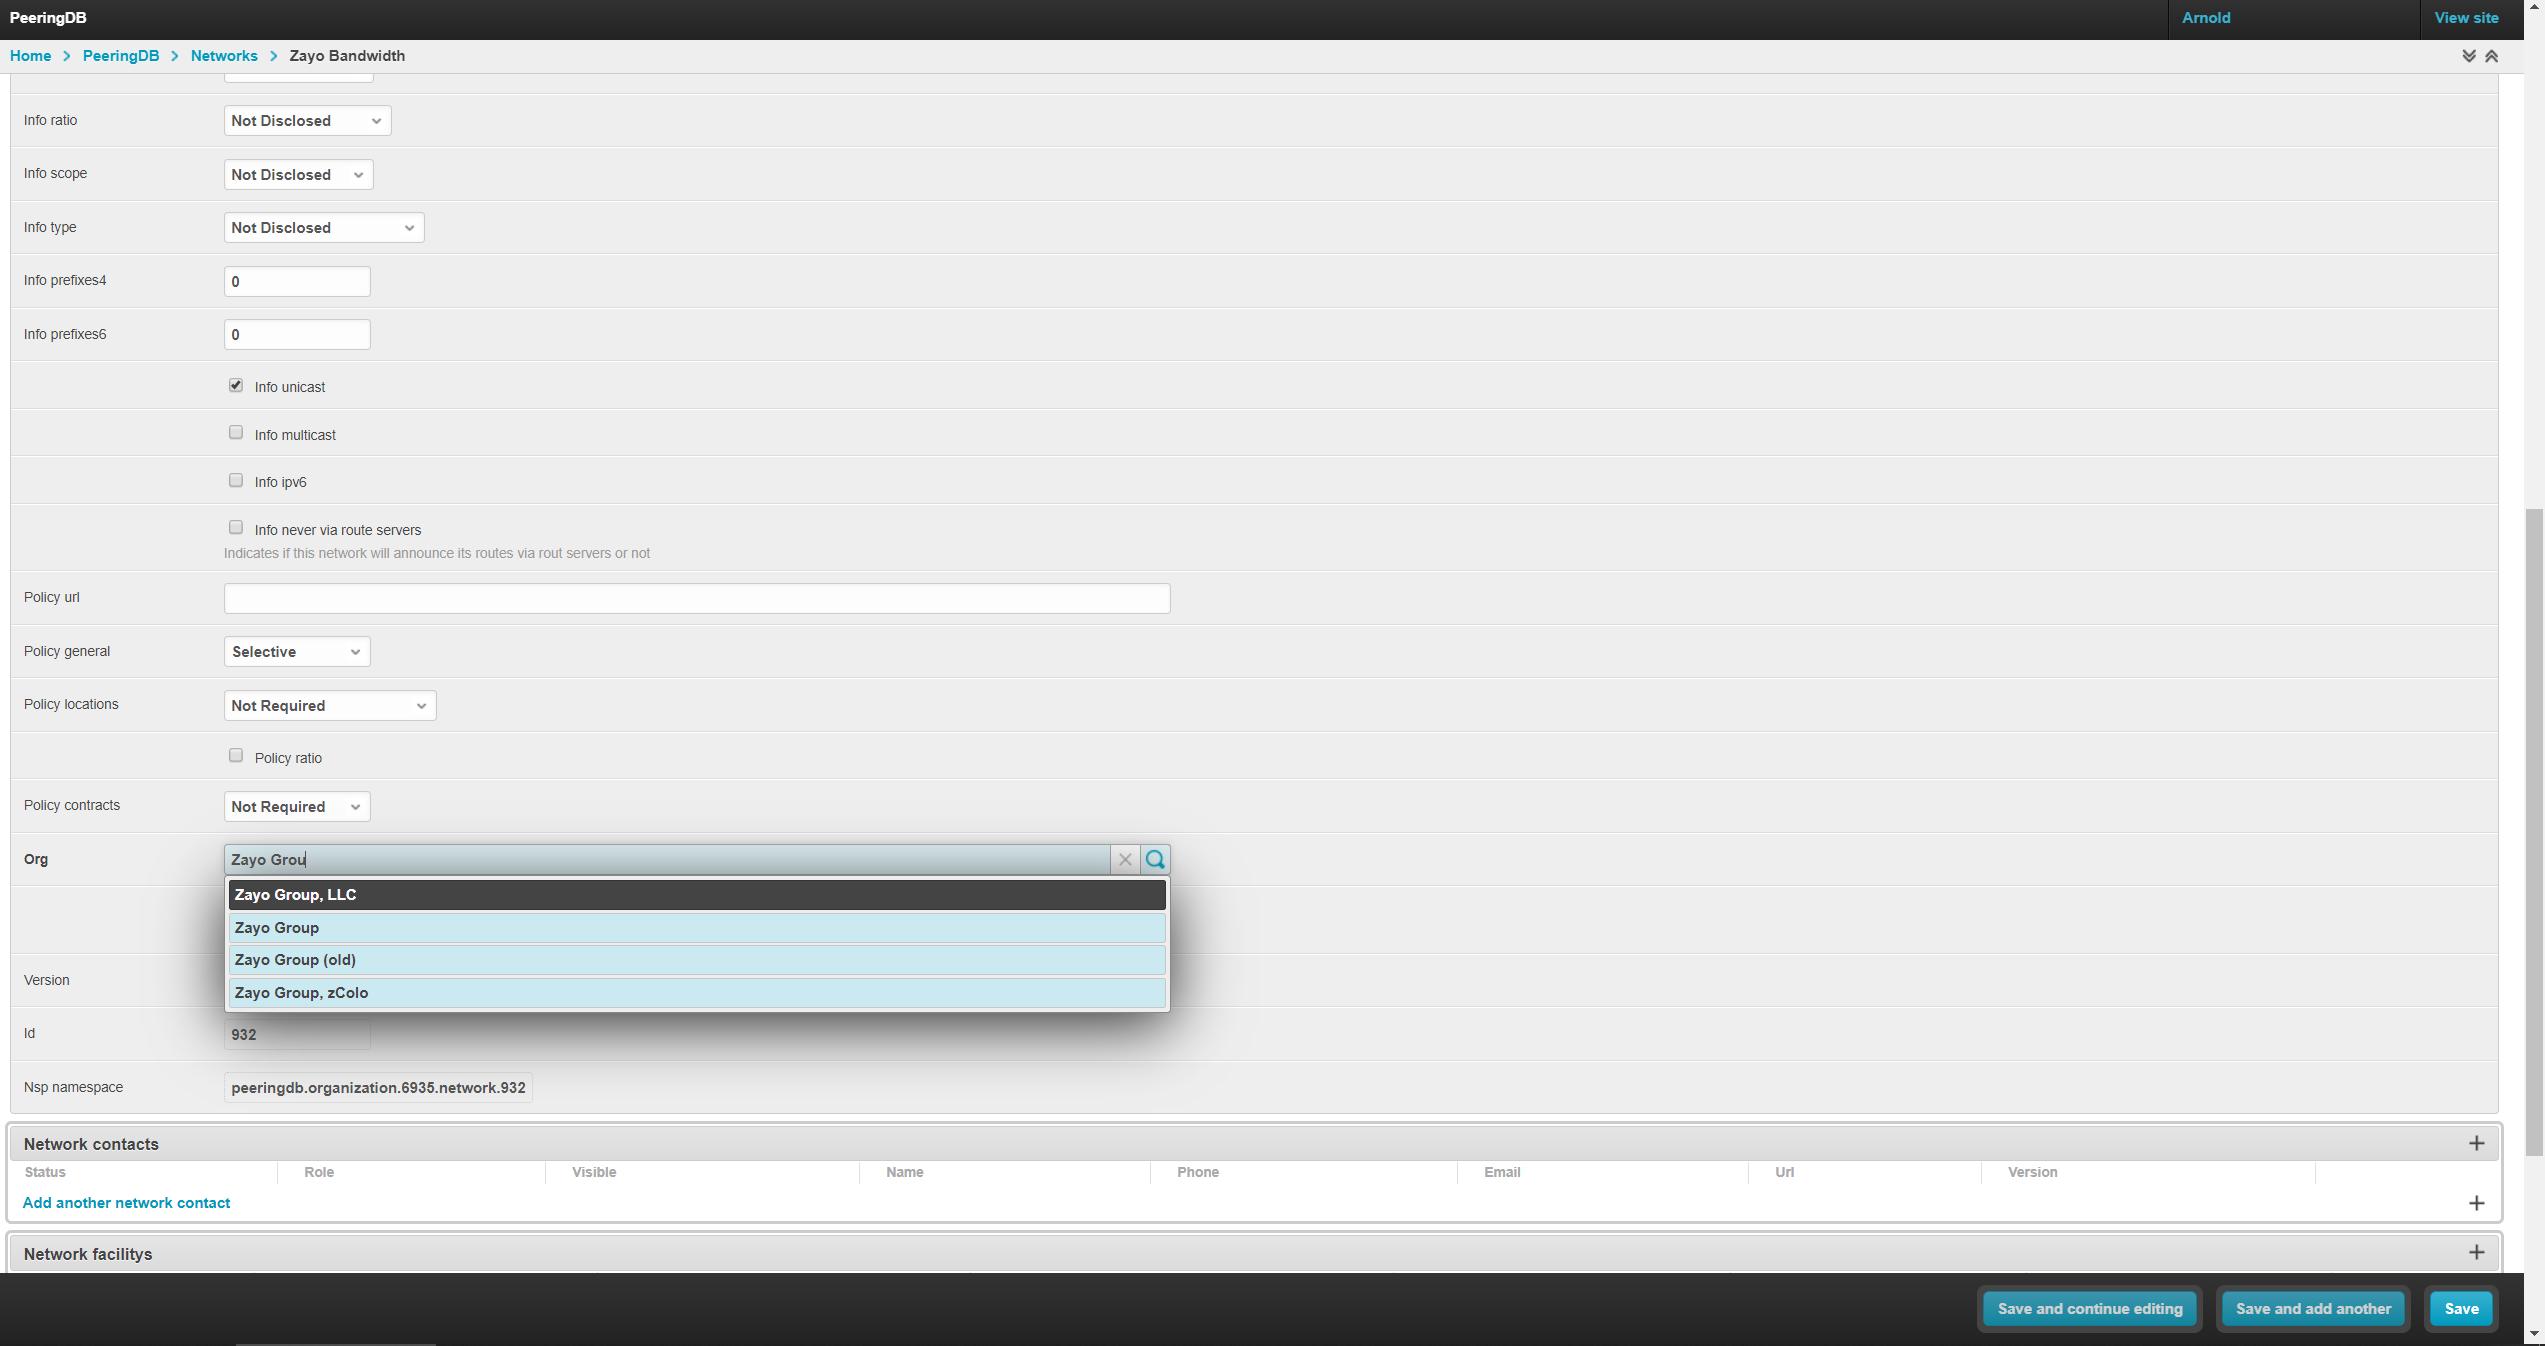 Screenshot 2020-03-16 00 43 56